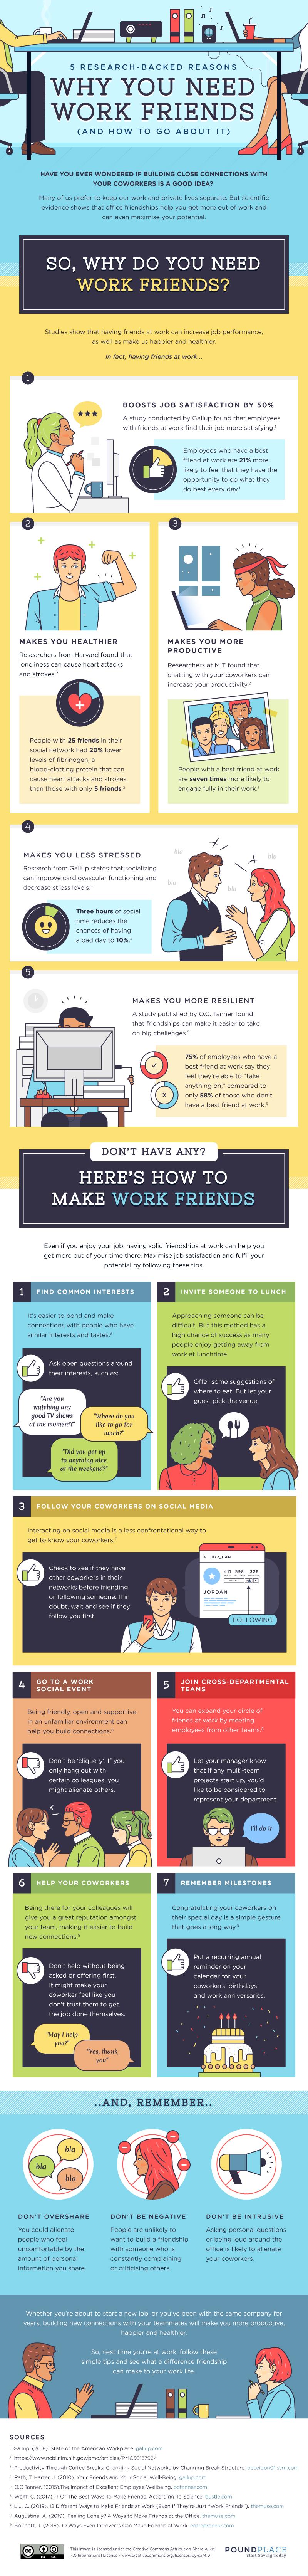 "5 motivi di ricerca-per-perché-ti-serve-lavoro ""width ="" 800 ""style ="" width: 800px; ""srcset ="" https://blog.hubspot.com/hs-fs/hubfs/ 5-ragioni-ricercate-perché-tu-hai-bisogno-lavoro-amici.jpg? Width = 400 & name = 5-ragioni-ricercate-ragioni-per-perché-hai-bisogno-lavoro-amici.jpg 400w, https: // blog .hubspot.com / HS-fs / hubfs / 5-ricerca-backed-motivi-perché-you-need-lavoro-friends.jpg? width = 800 & name = 5-ricerca-backed-motivi-perché-you-need-lavoro -friends.jpg 800w, https://blog.hubspot.com/hs-fs/hubfs/5-research-backed-reasons-why-you-need-work-friends.jpg?width=1200&name=5-research- backed-reason-why-you-need-work-friends.jpg 1200w, https://blog.hubspot.com/hs-fs/hubfs/5-research-backed-reasons-why-you-need-work-friends .jpg? width = 1600 & name = 5-research-backed-reason-why-you-need-work-friends.jpg 1600w, https://blog.hubspot.com/hs-fs/hubfs/5-research-backed- reason-why-you-need-work-friends.jpg? width = 2000 & name = 5-research-backed-reason-why-you-need-work-friends.jpg 2000w, https://blog.hubspot.com/hs -fs / hubfs / 5-ricerca-b acked-reason-why-you-need-work-friends.jpg? width = 2400 & name = 5-research-backed-reason-why-you-need-work-friends.jpg 2400w ""sizes ="" (larghezza massima: 800 px ) 100vw, 800px"